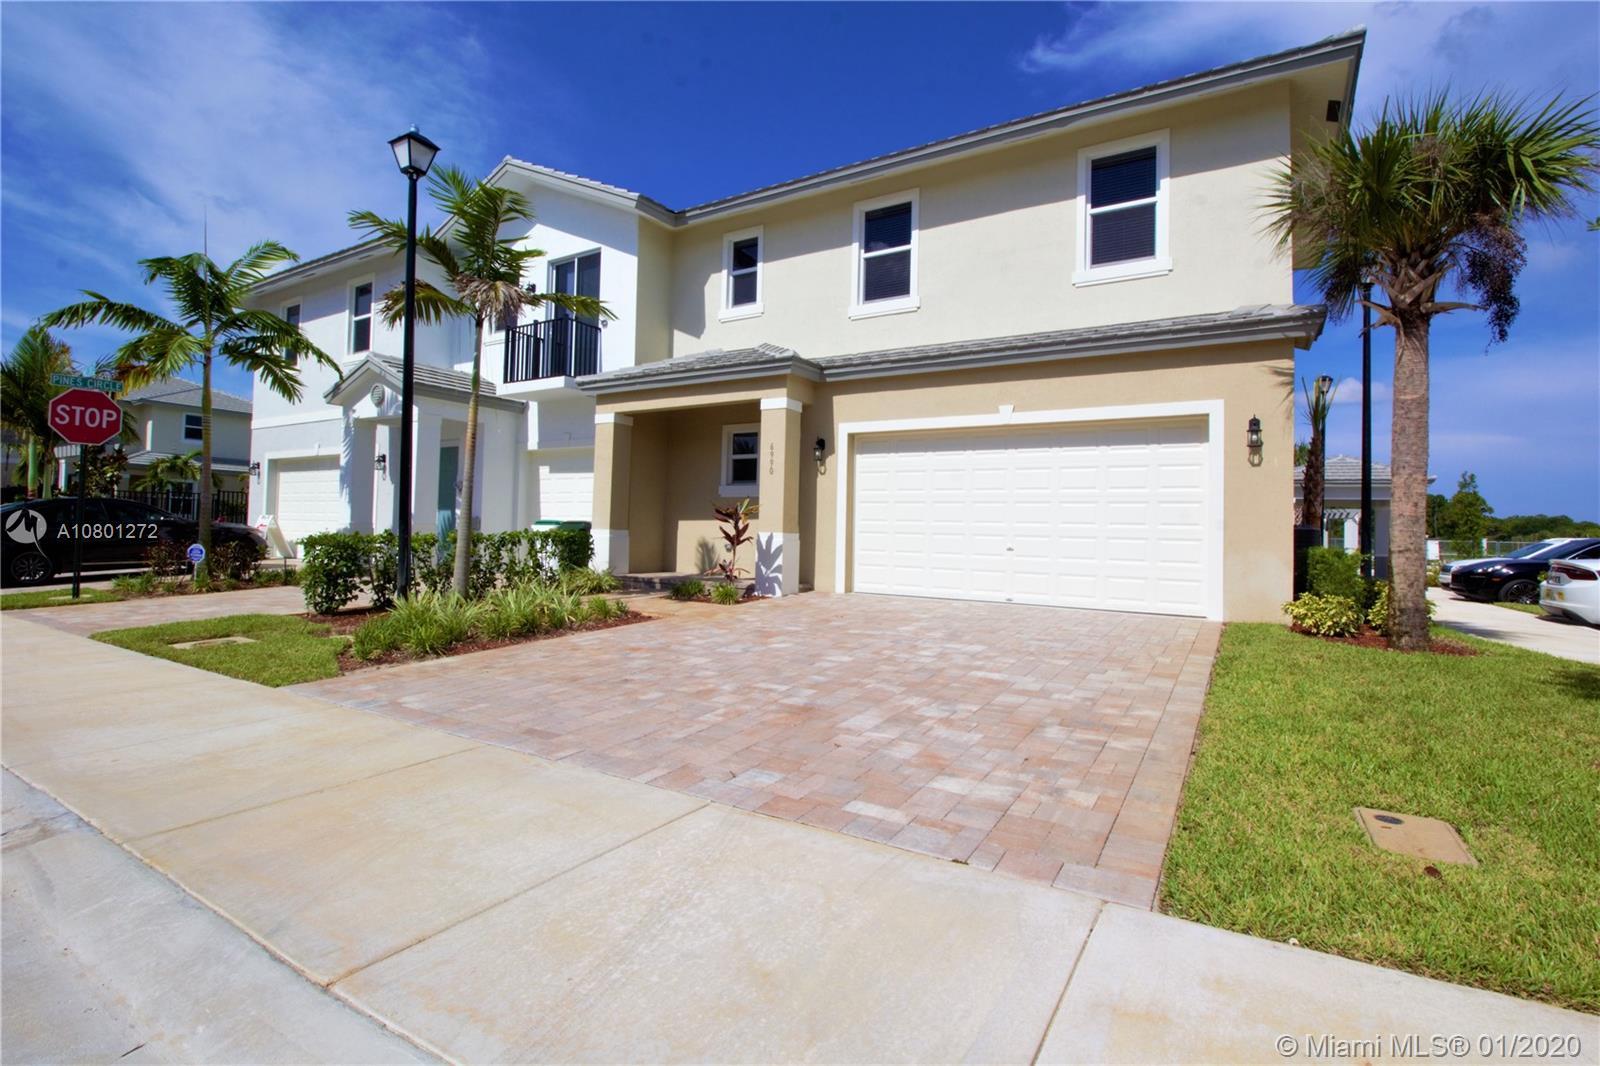 6990 Pines Cir 6990, Coconut Creek, FL 33073